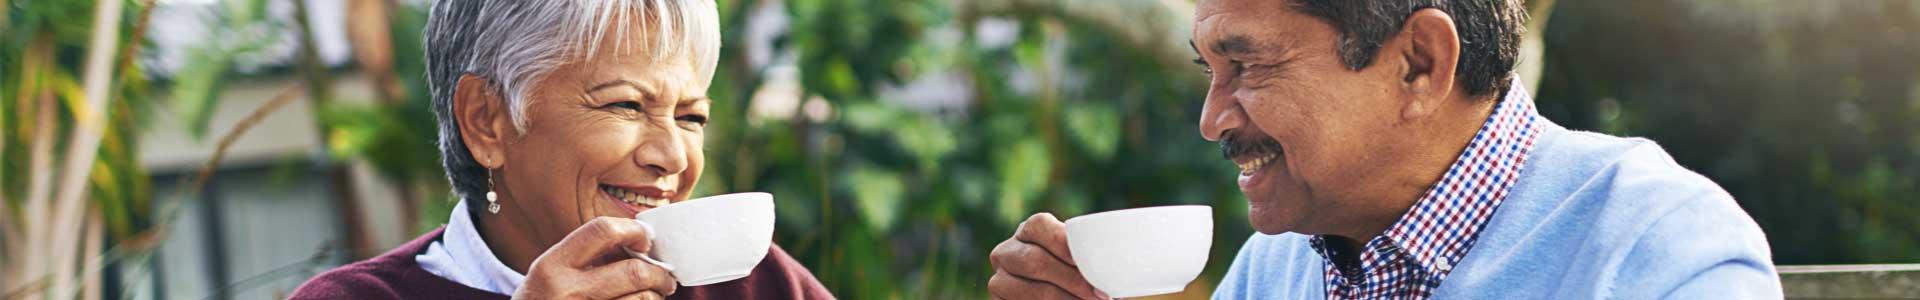 senior couple enjoying tea together outside